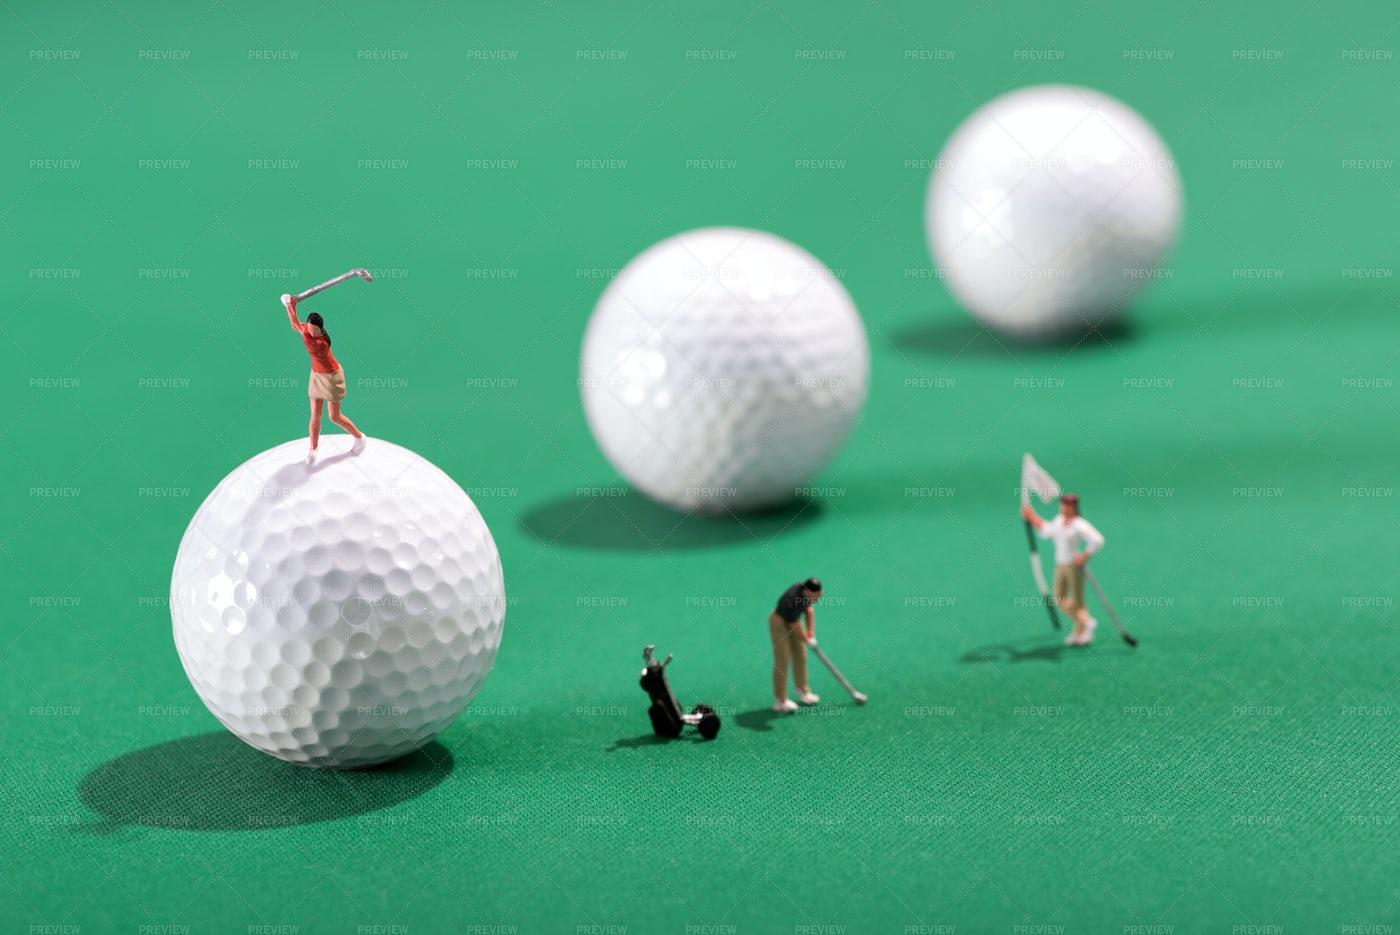 Miniature Figures Of Golfers: Stock Photos